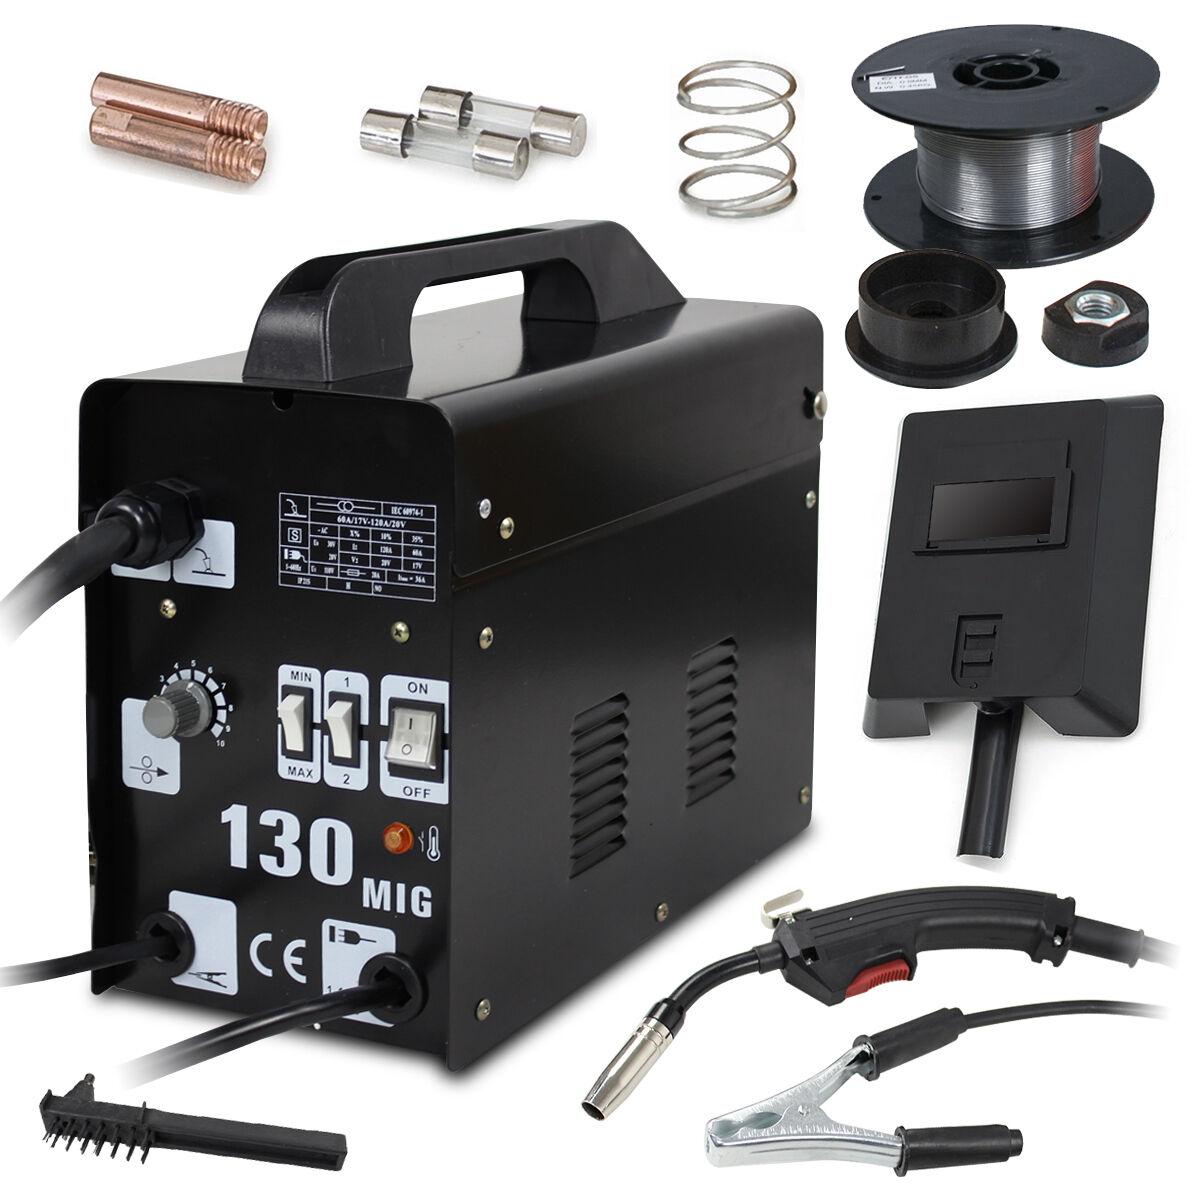 GSDD13001A greatshoppingday2012 MIG 130 Welder Gas Less Flux Core Wire Automatic Feed Welding Machine W/ Mask